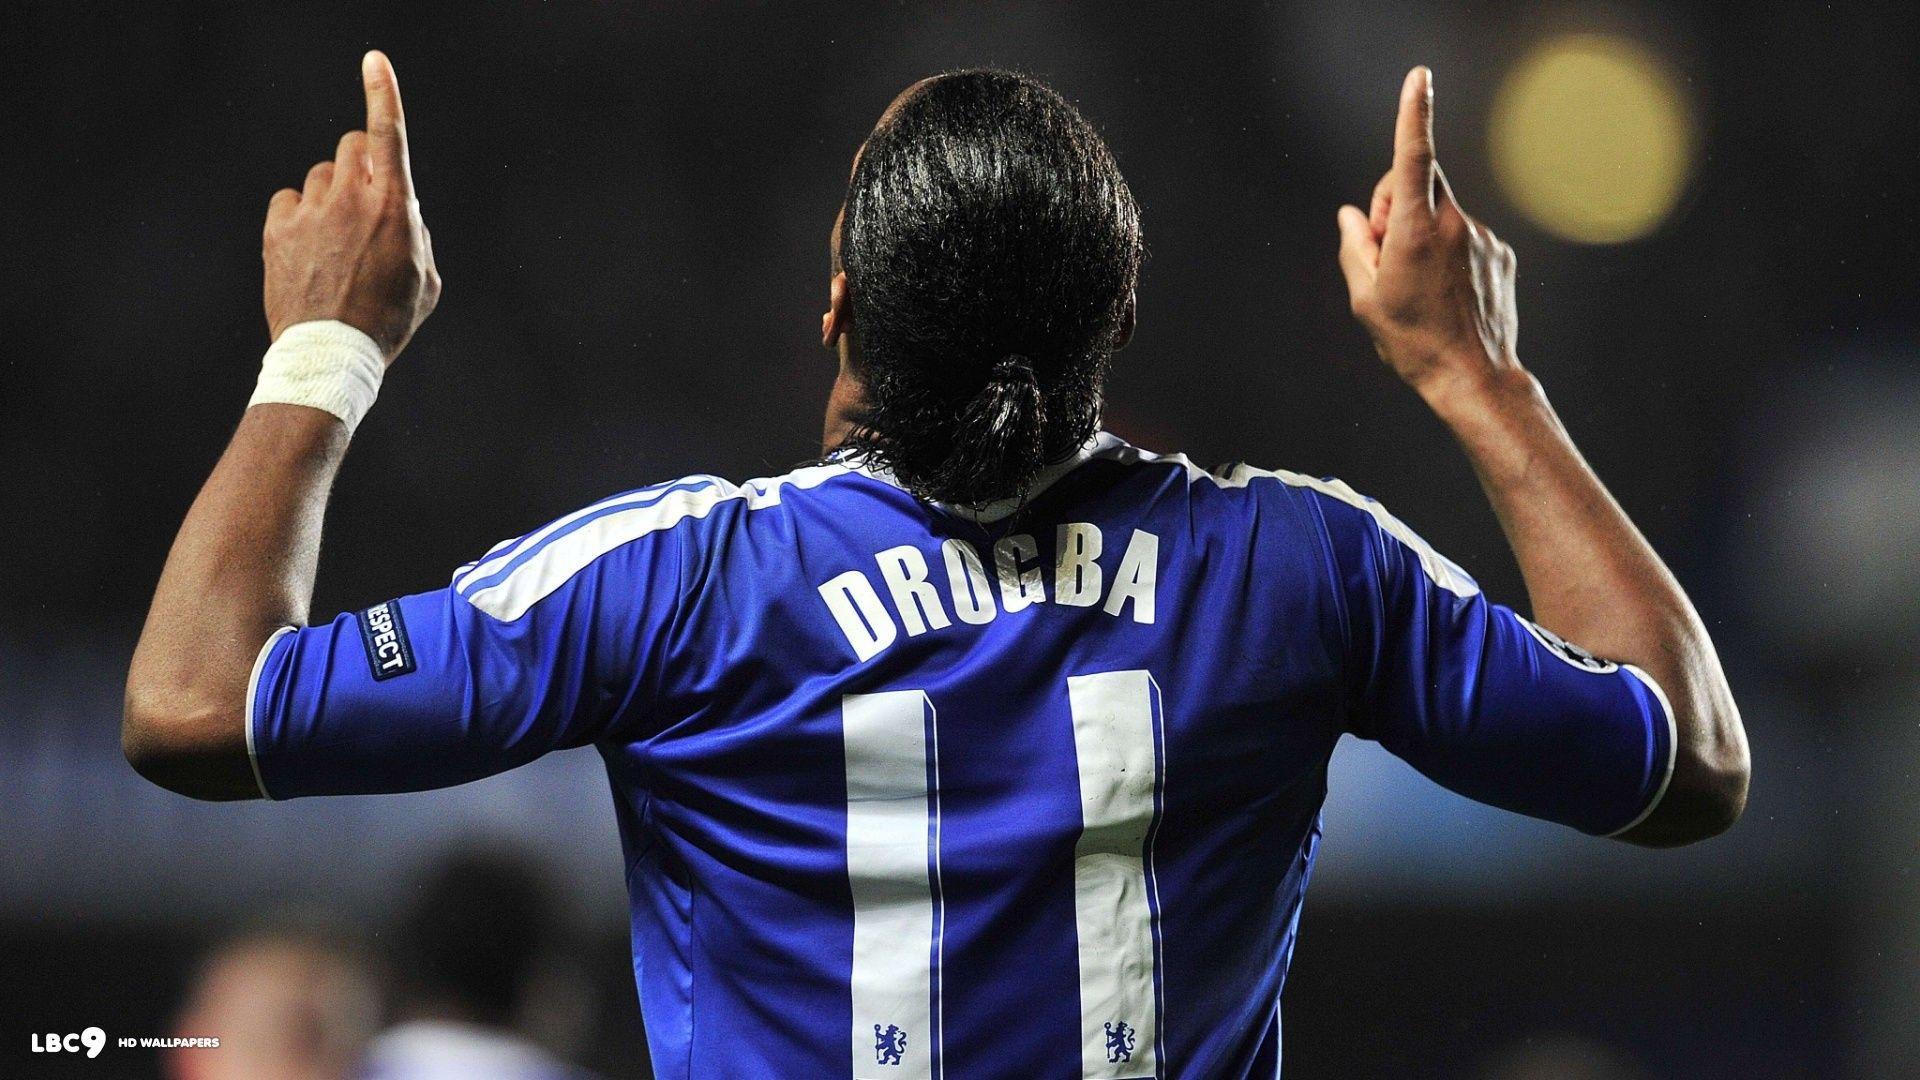 People 1920x1080 Chelsea FC Didier Drogba men soccer sport sports ... 9d767b108